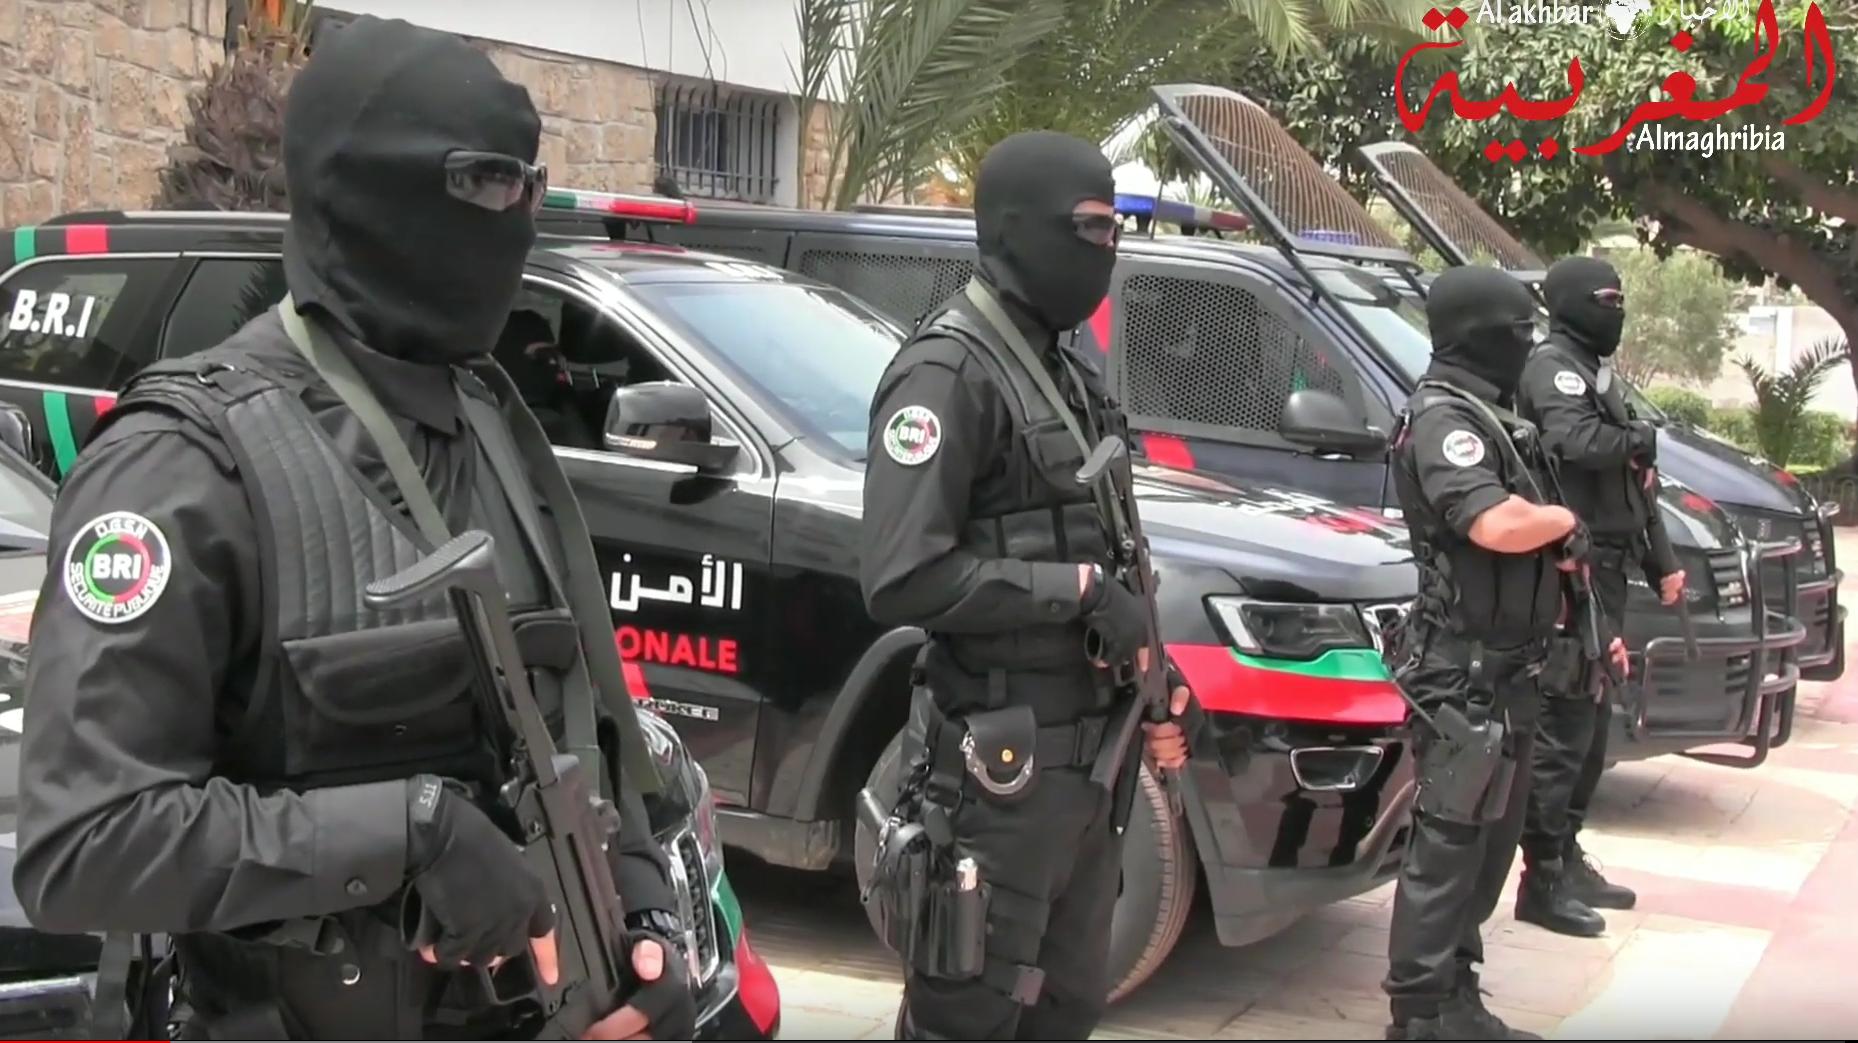 Moroccan Special Forces/Forces spéciales marocaines  :Videos et Photos : BCIJ, Gendarmerie Royale ,  - Page 16 1558059398-screenshot-8